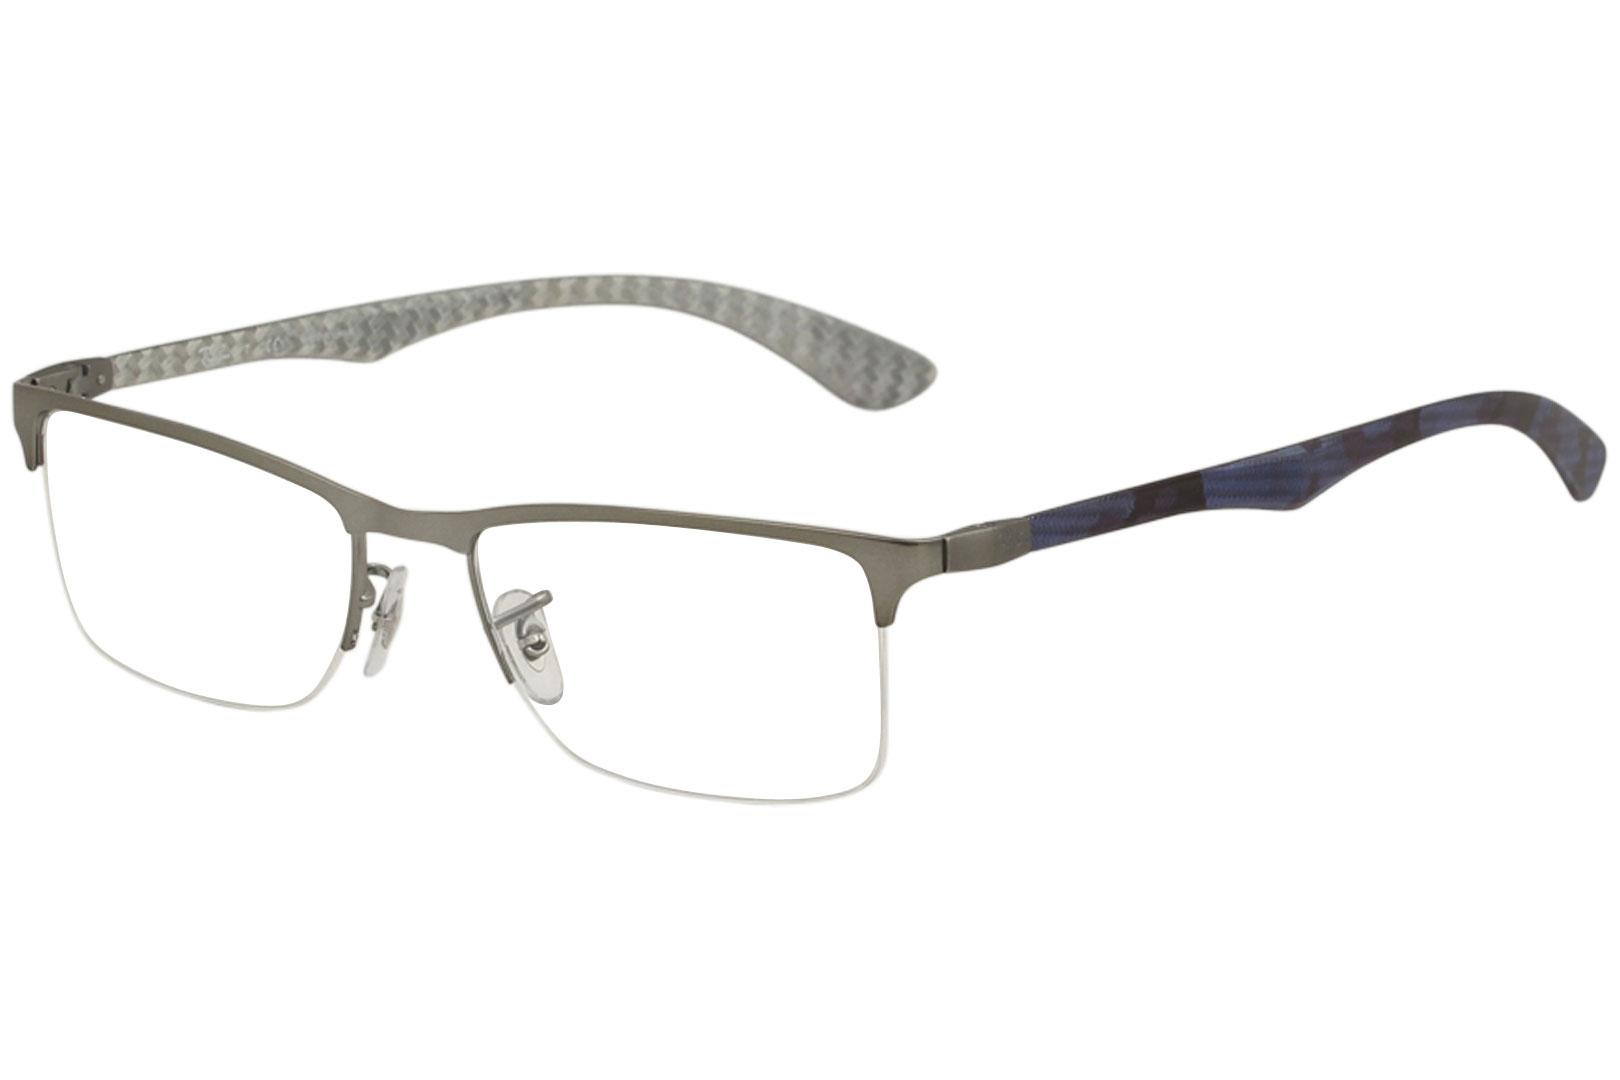 Ray-Ban Men\'s Eyeglasses RX8413 RX/8413 RayBan Half Rim Optical Frame